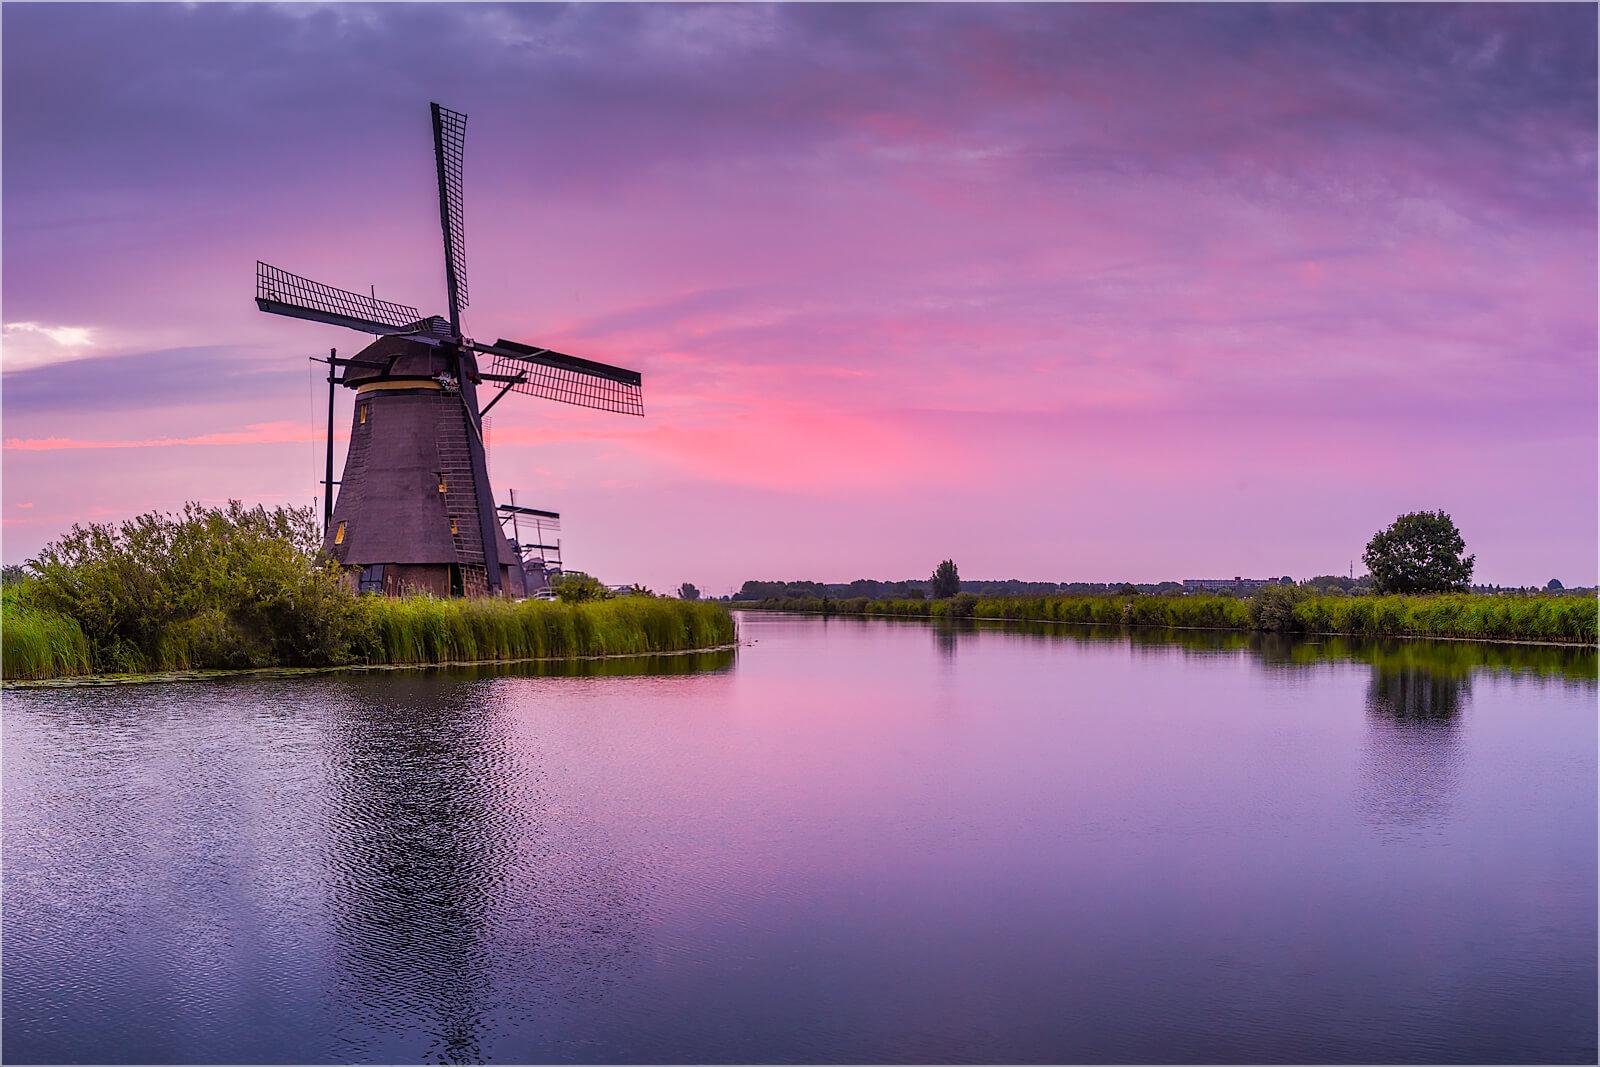 Wanddeko Windmühle in Kinderdijk Holland